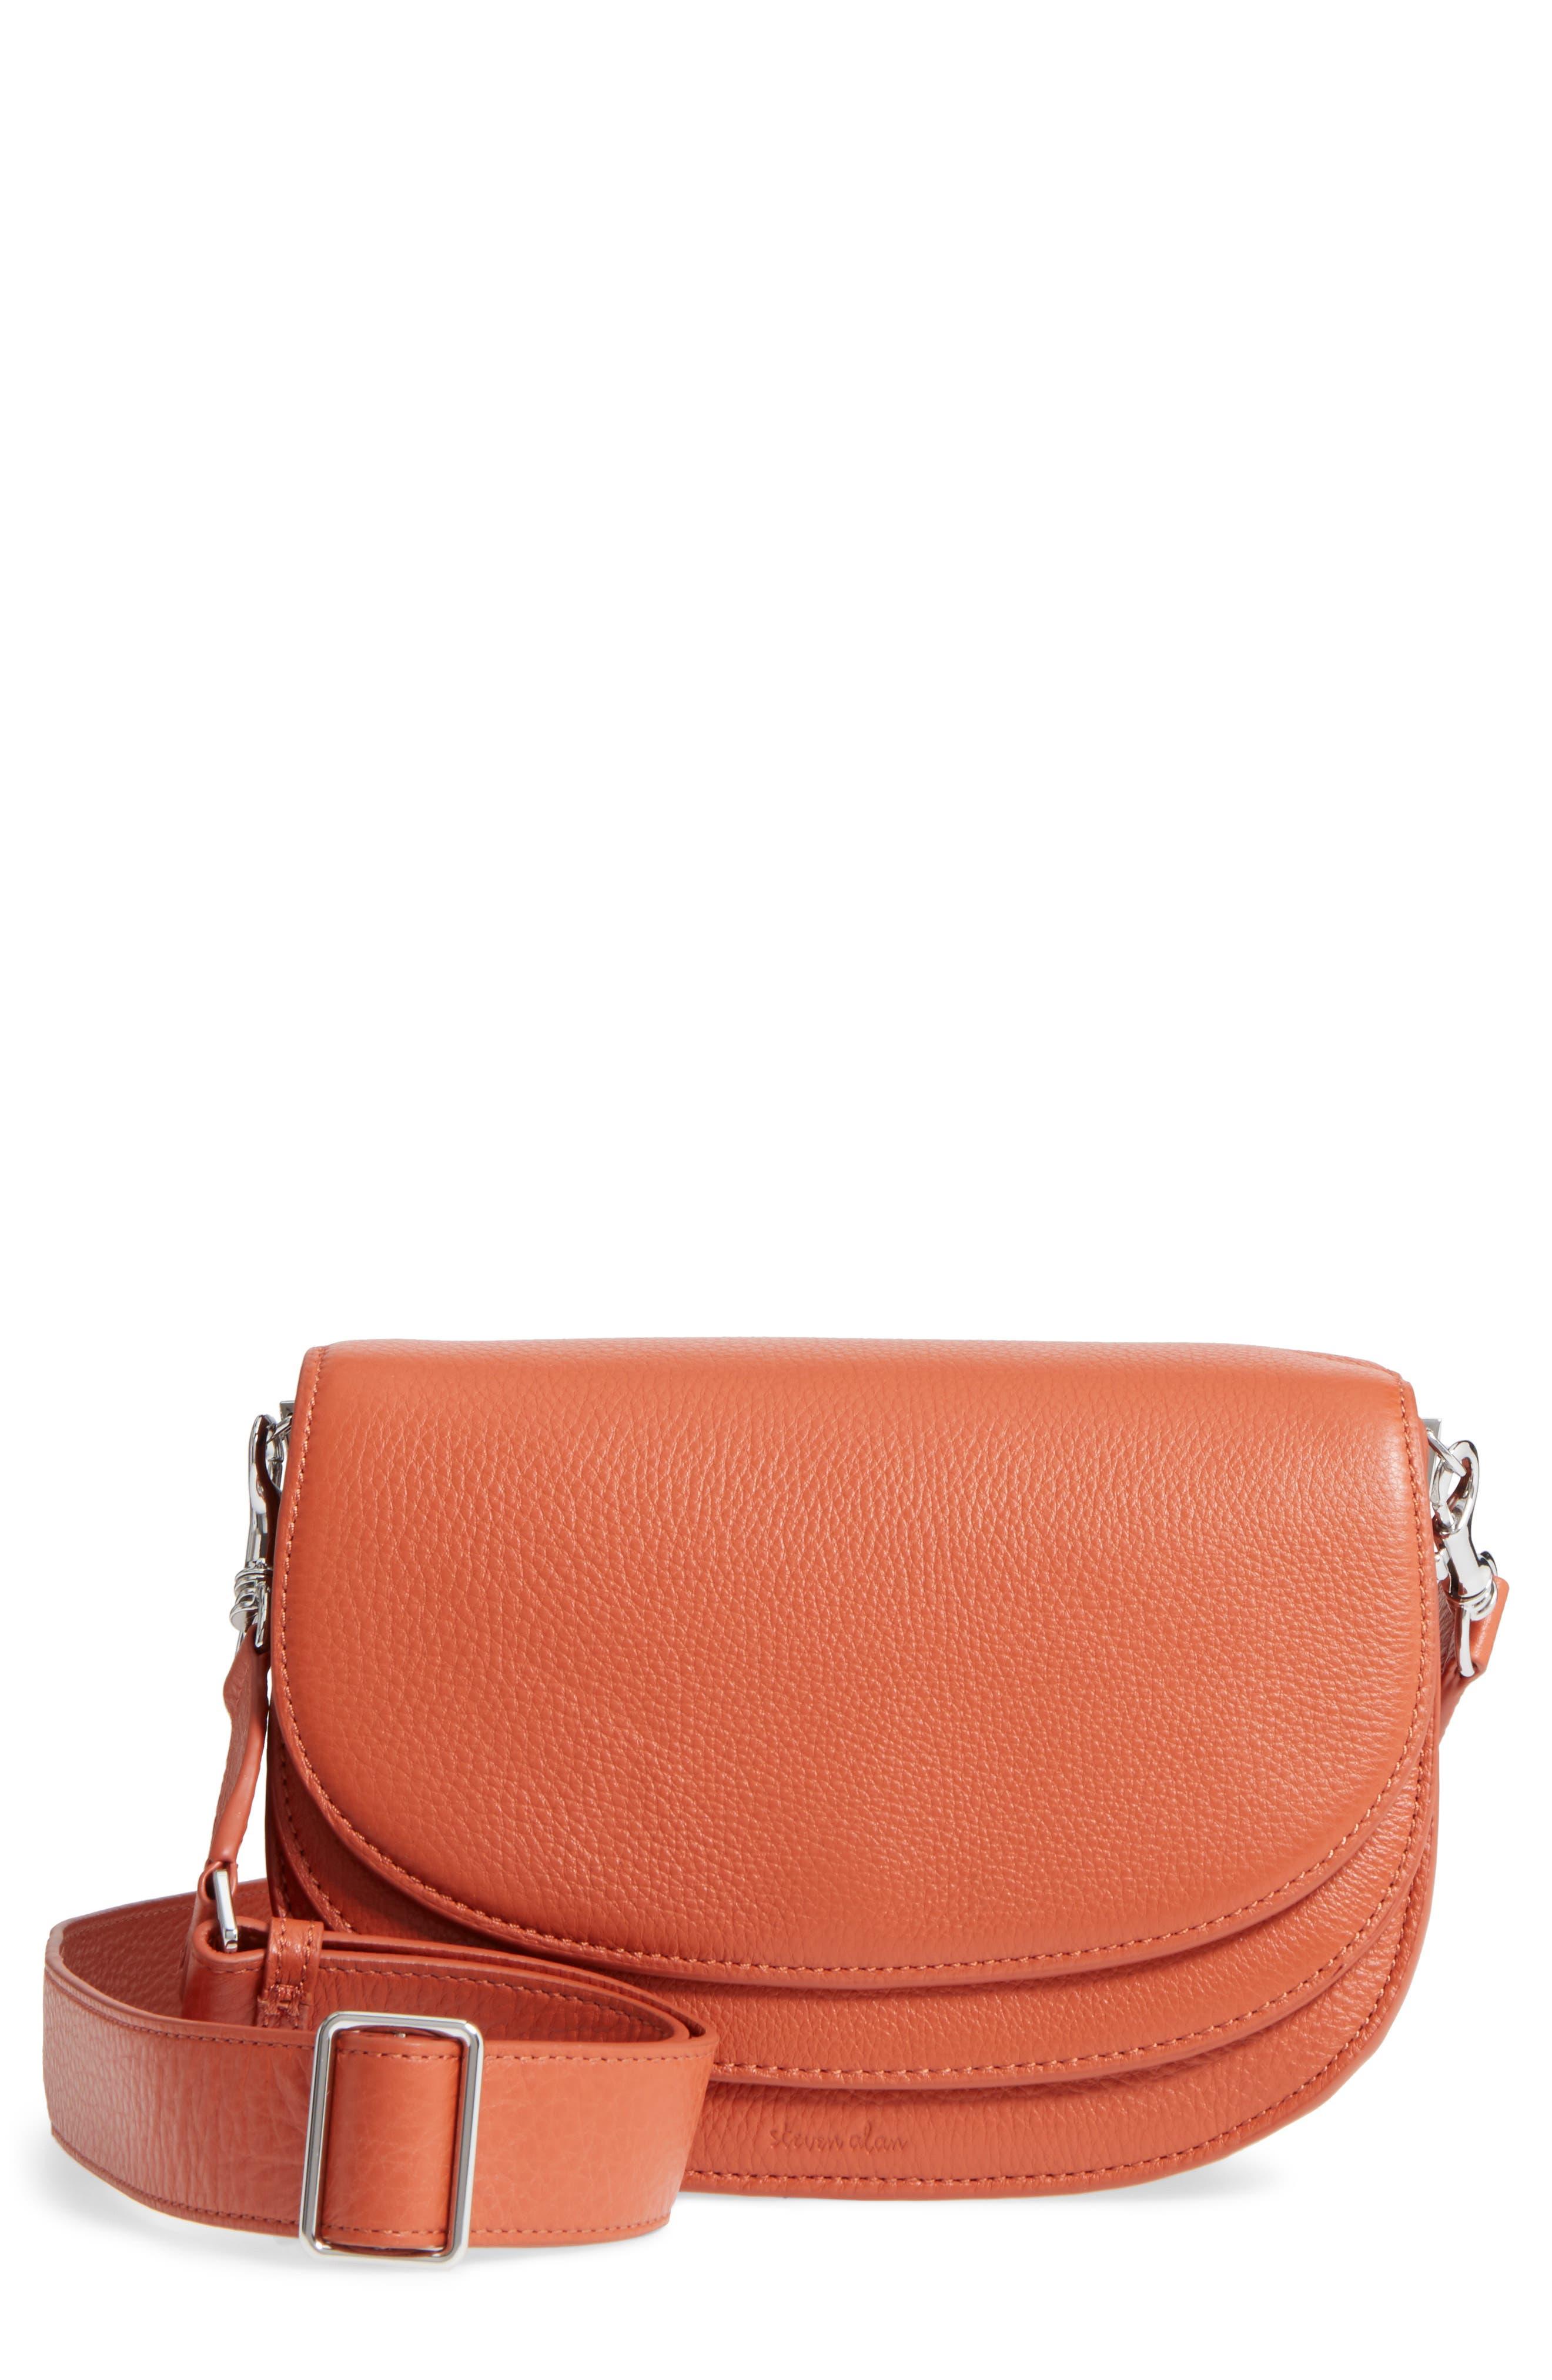 Landon Leather Crossbody Saddle Bag,                             Main thumbnail 4, color,